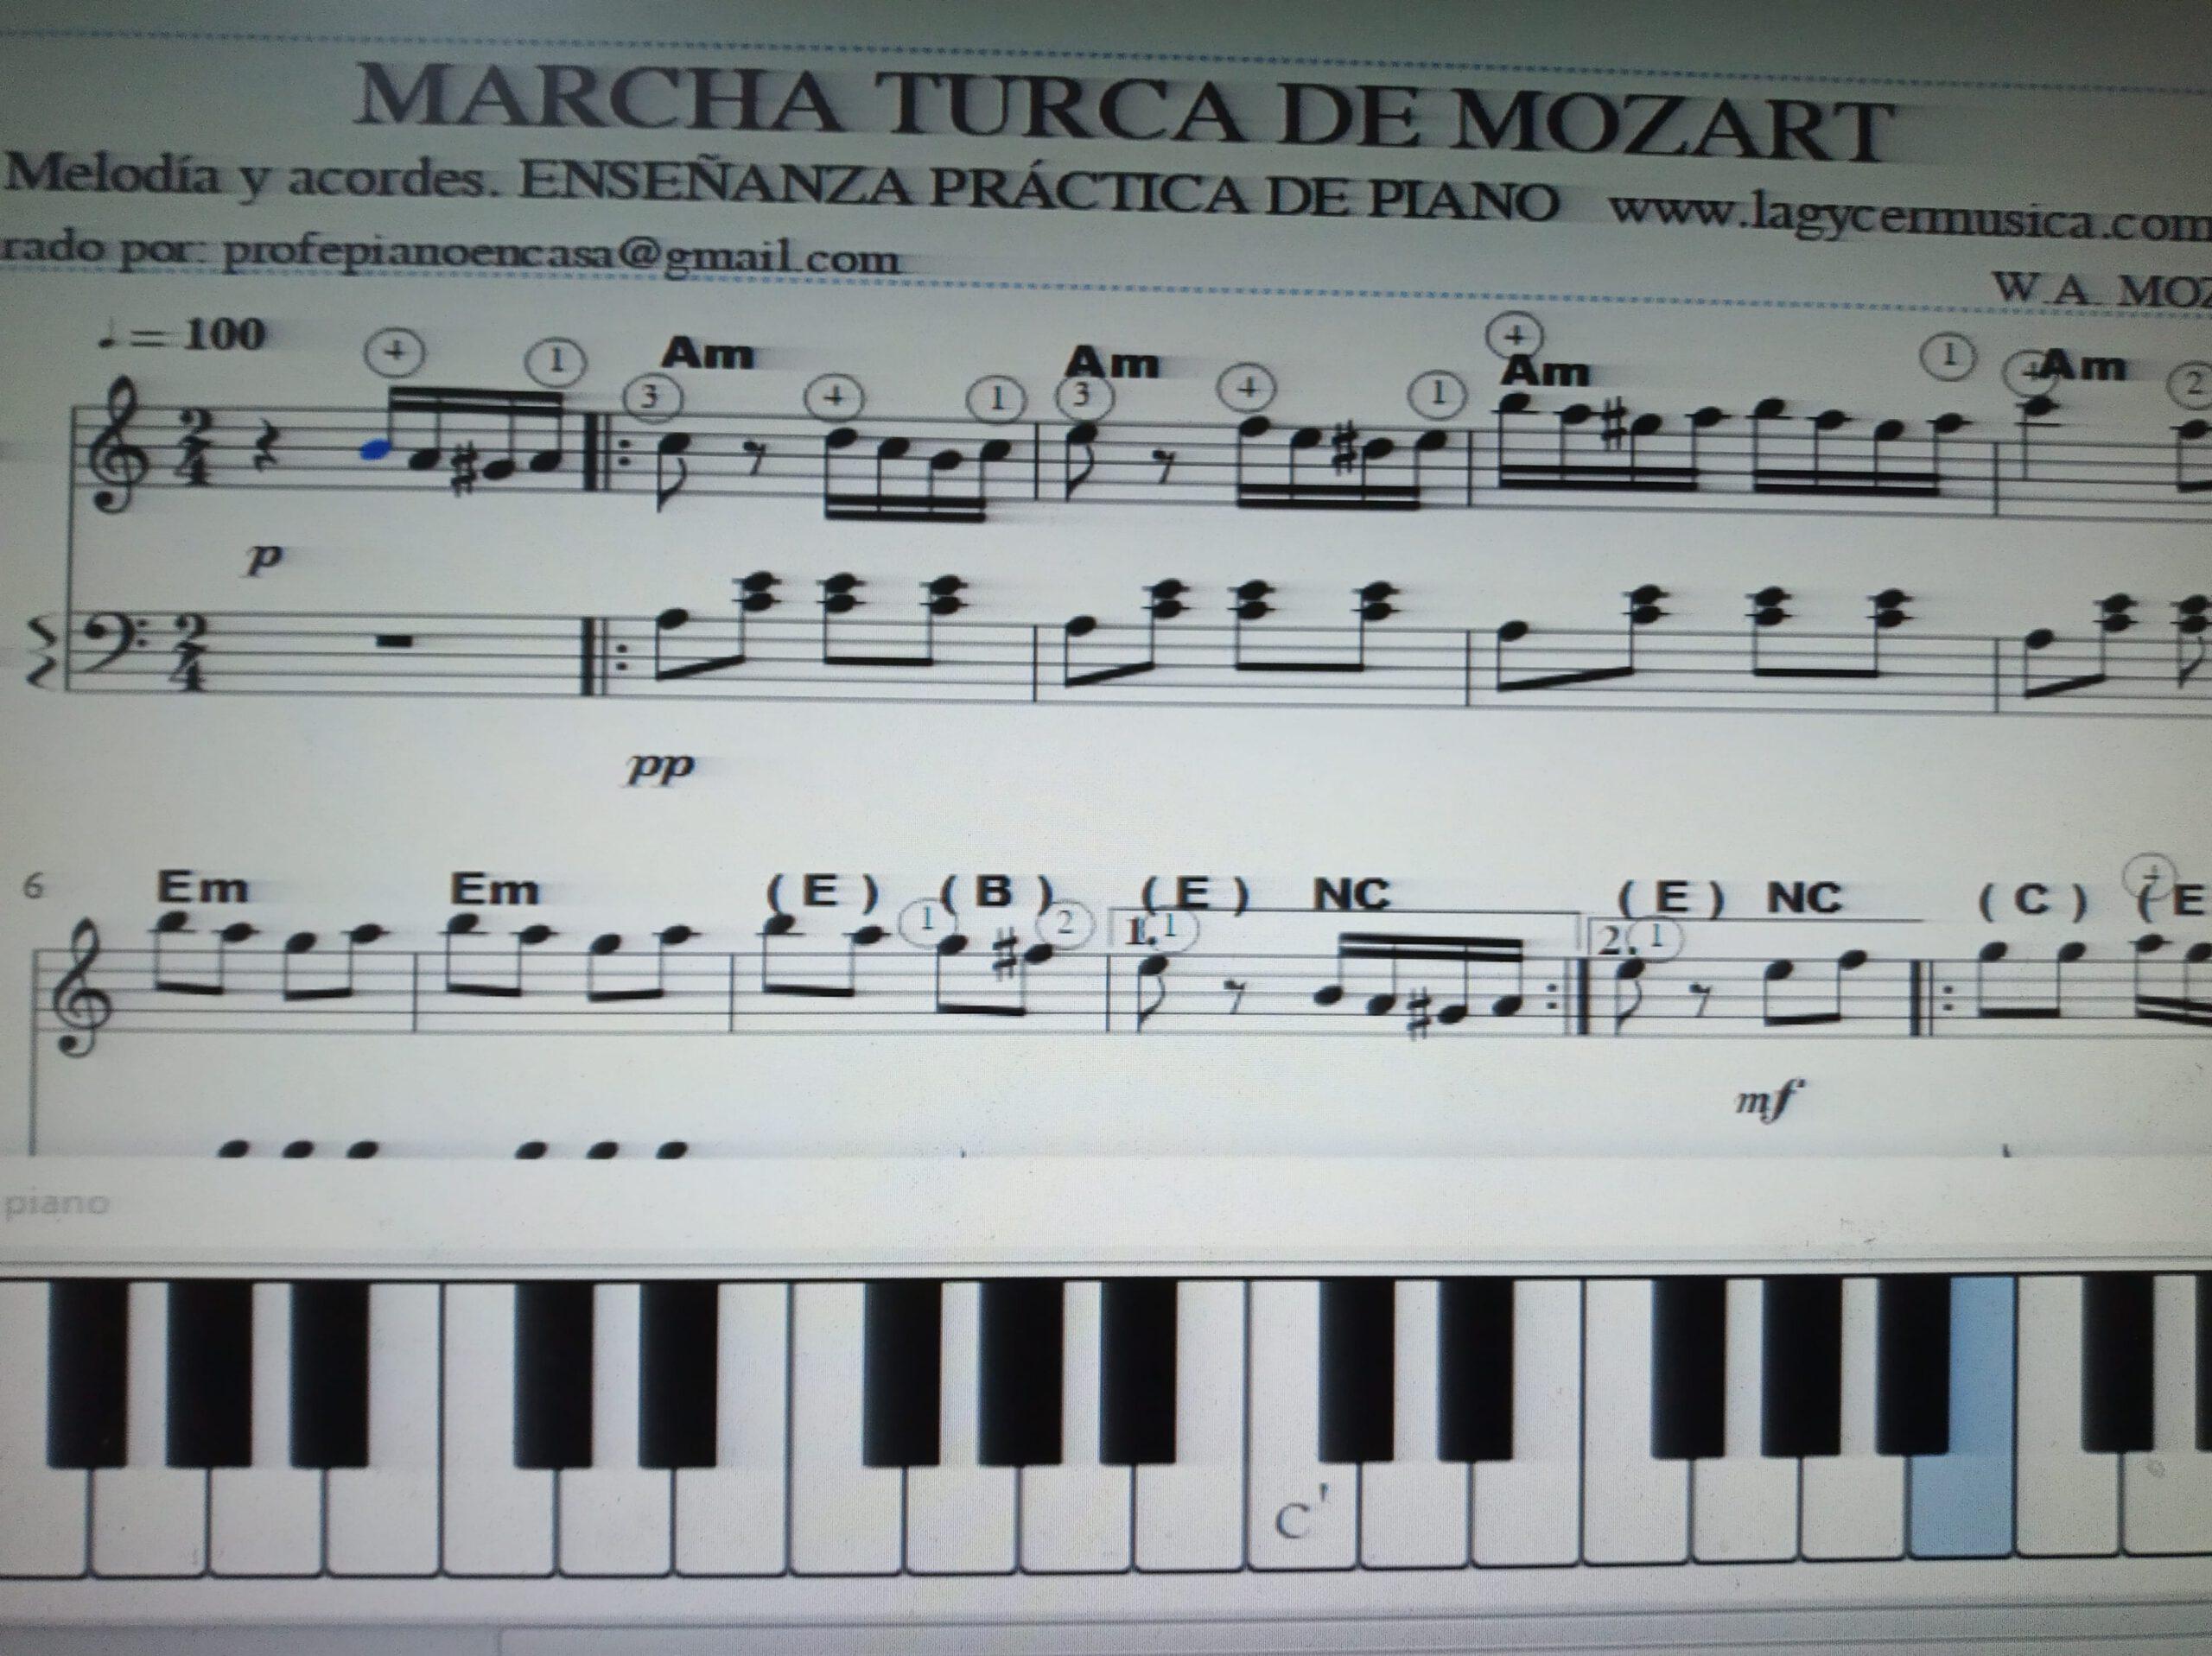 Marcha Turca De Mozart Lagycer Musica